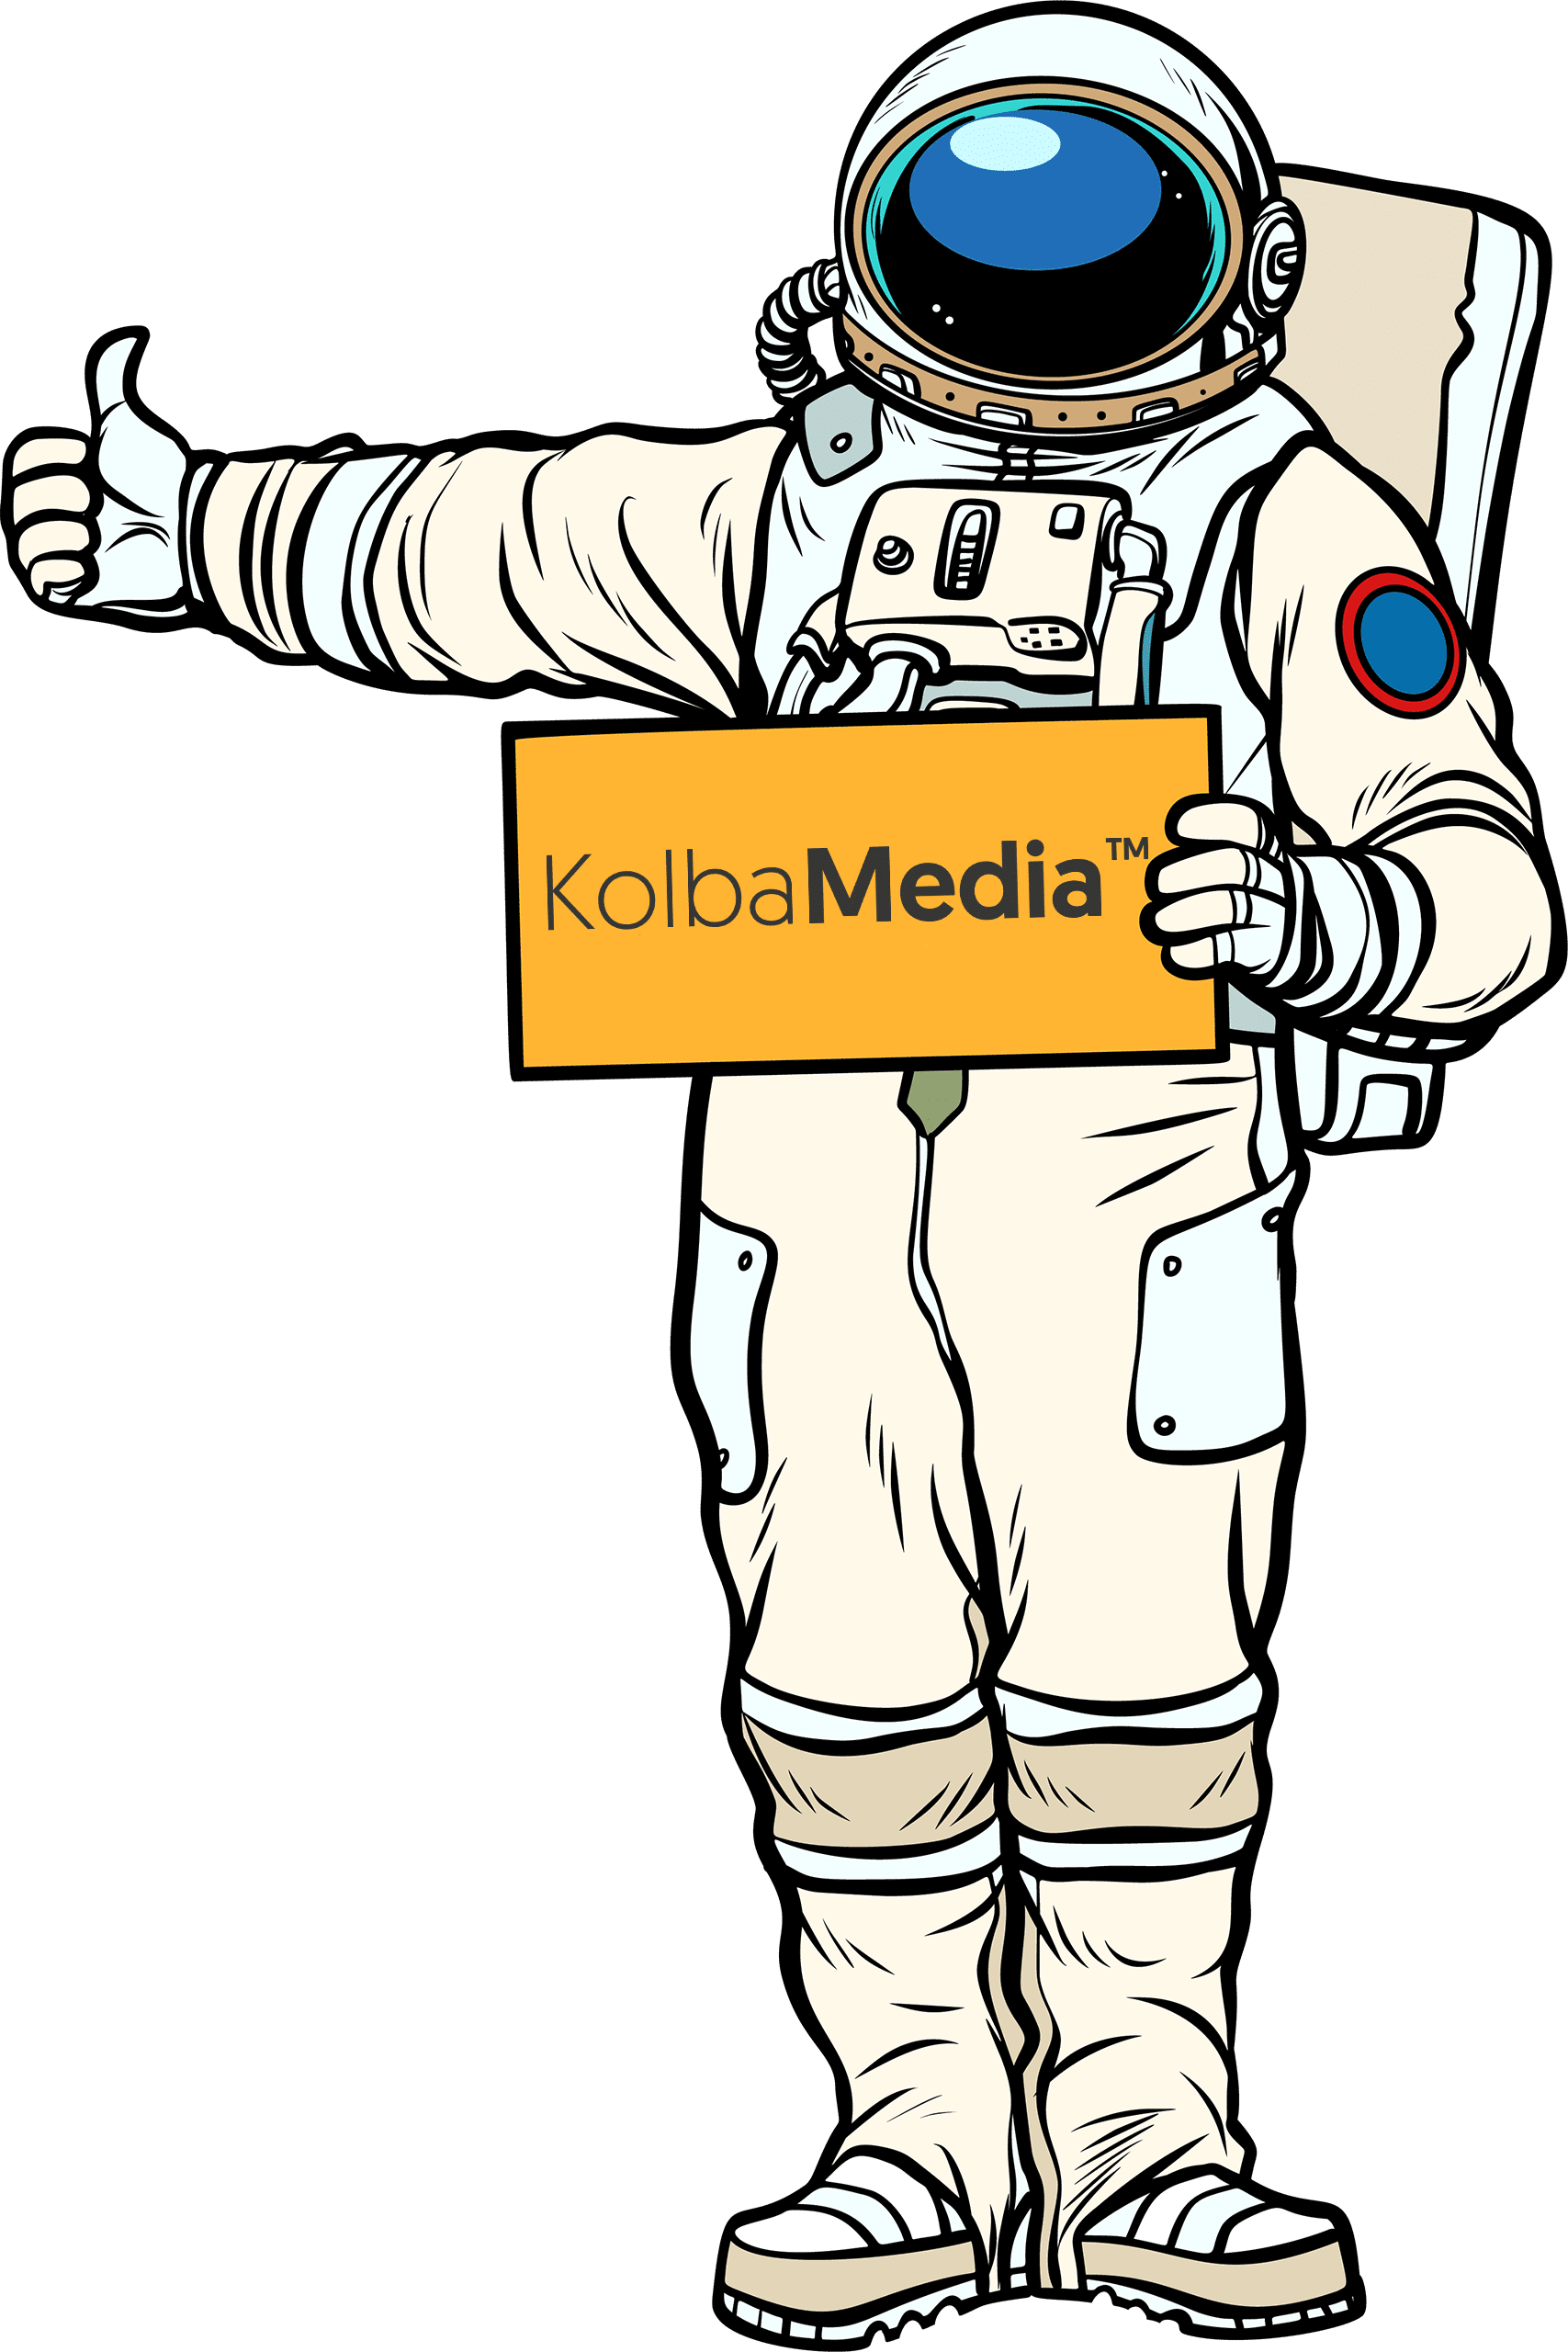 astronaut kolbamedia